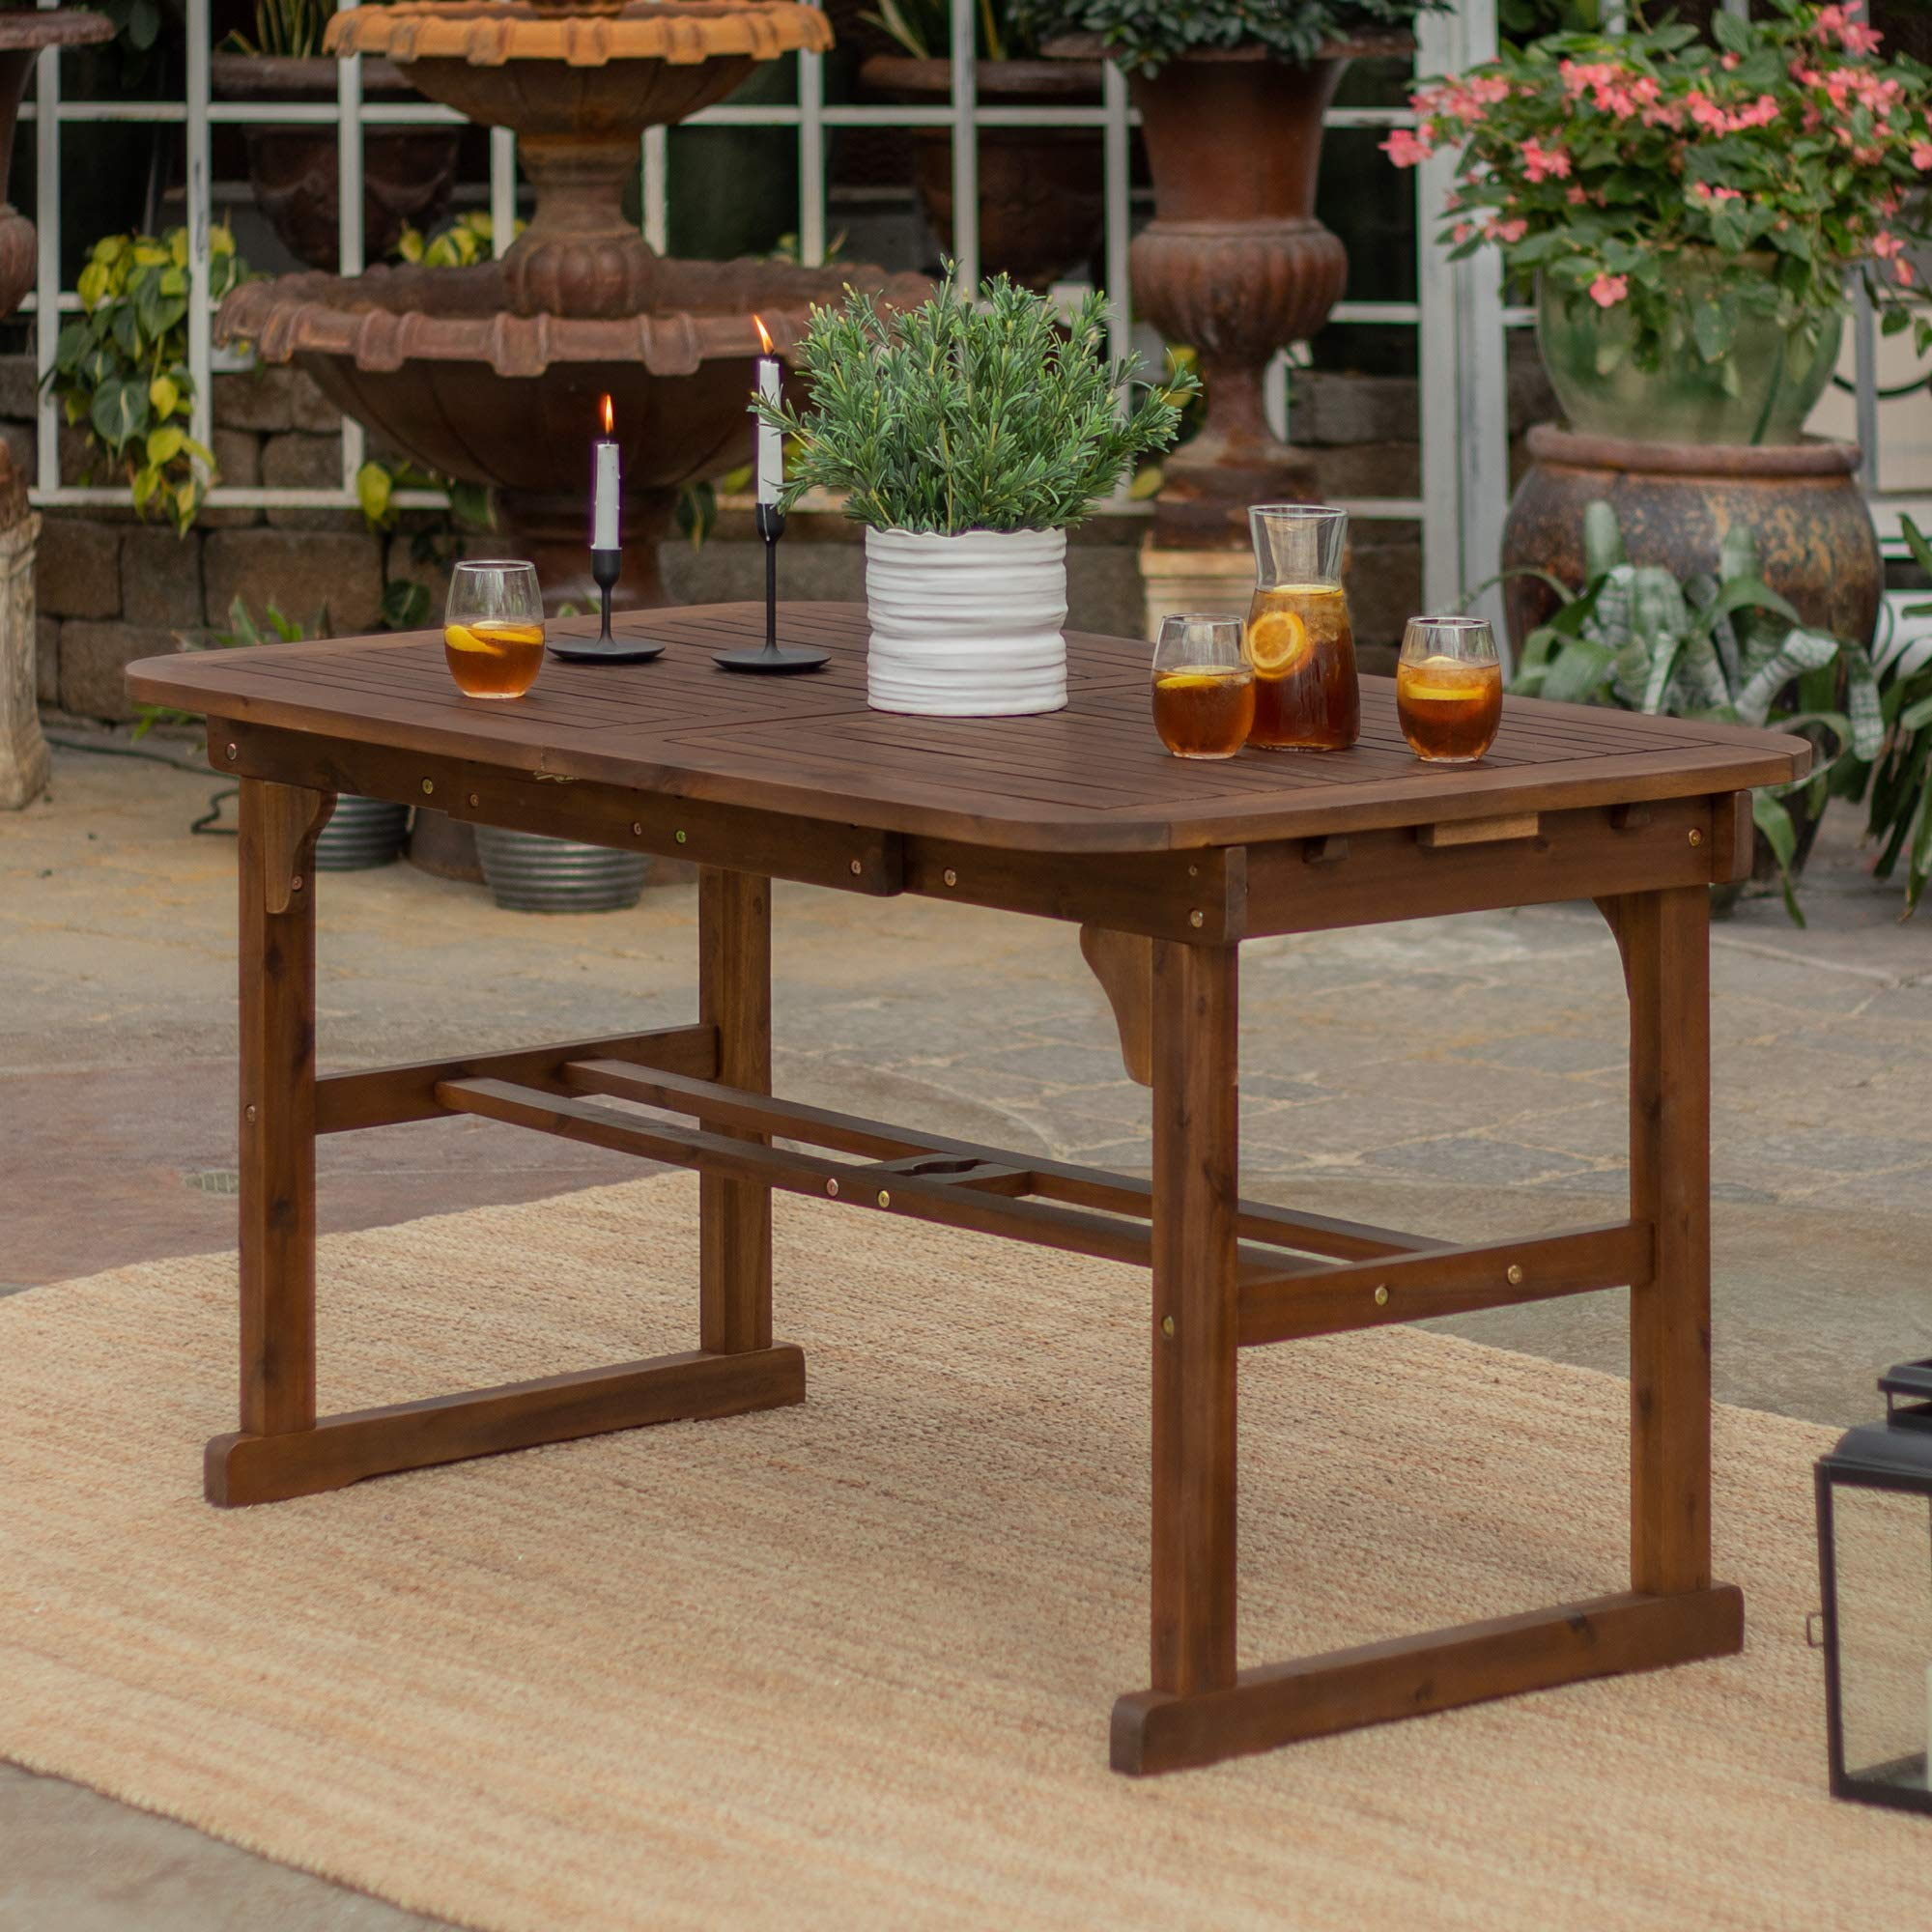 Walker Edison Maui Modern Solid Acacia Wood Slatted Patio Dining Table, 78 Inch, Dark Brown